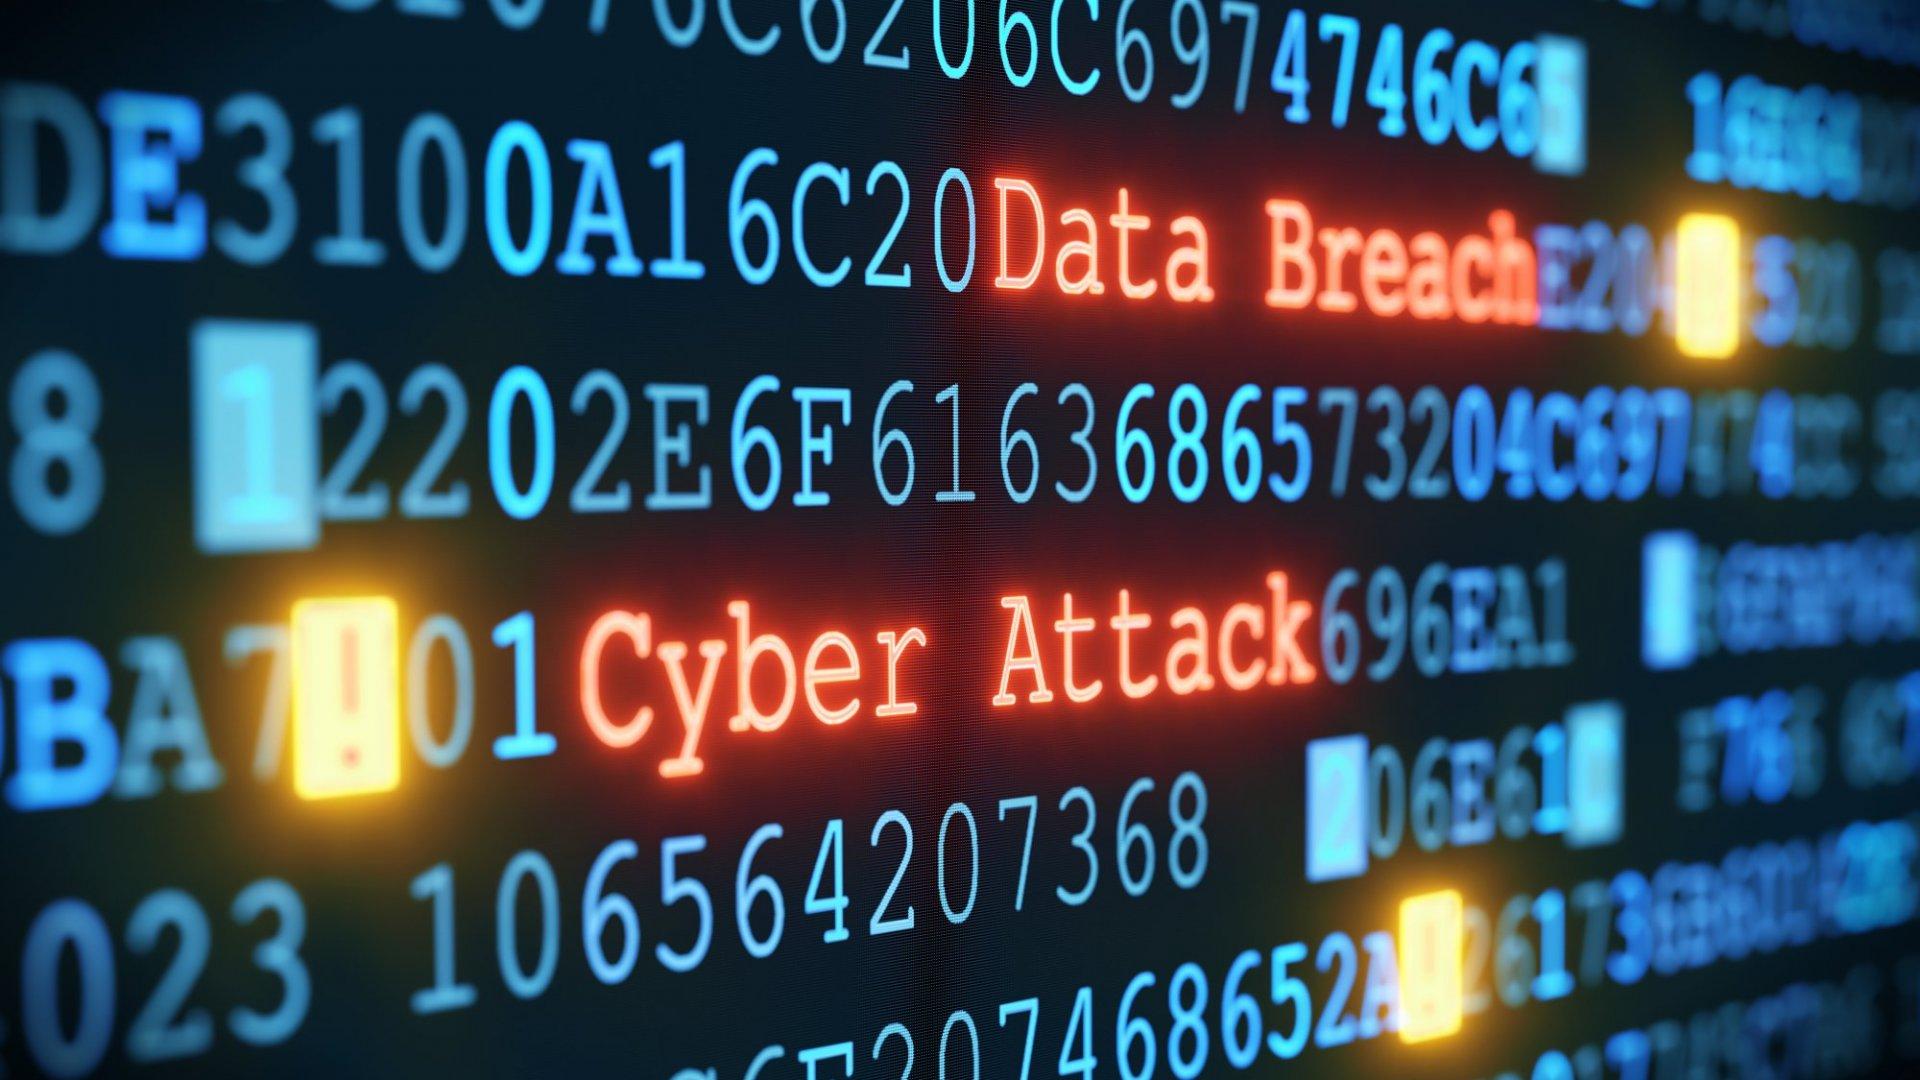 Cyberattack Illustration